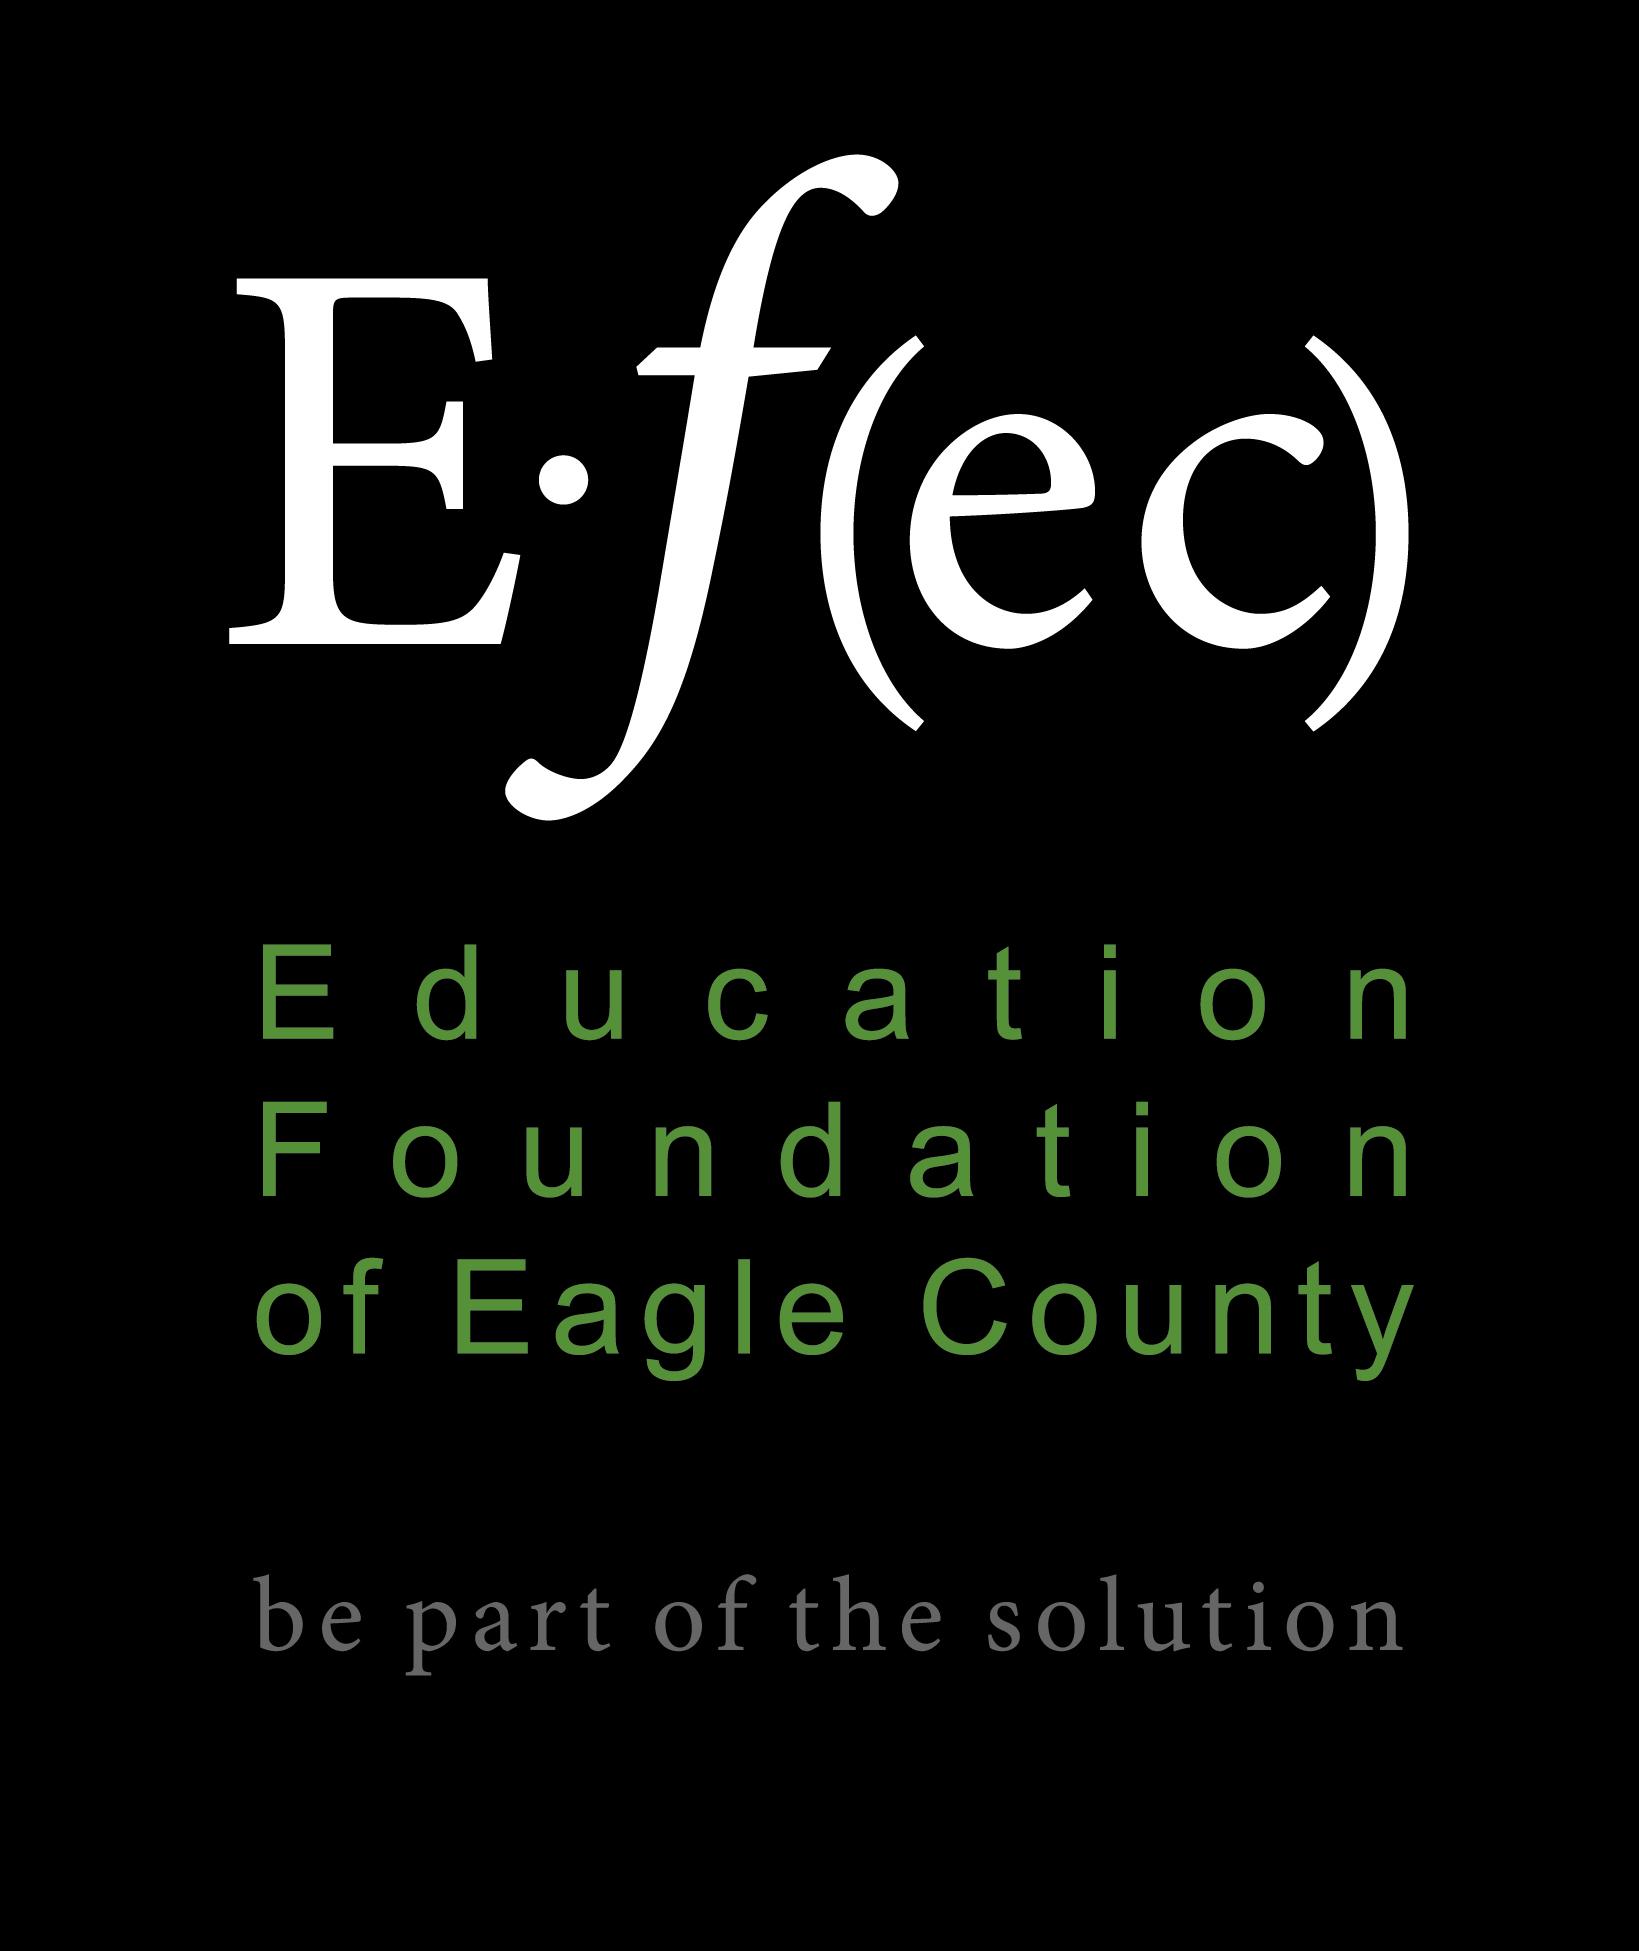 Efec_logo_final